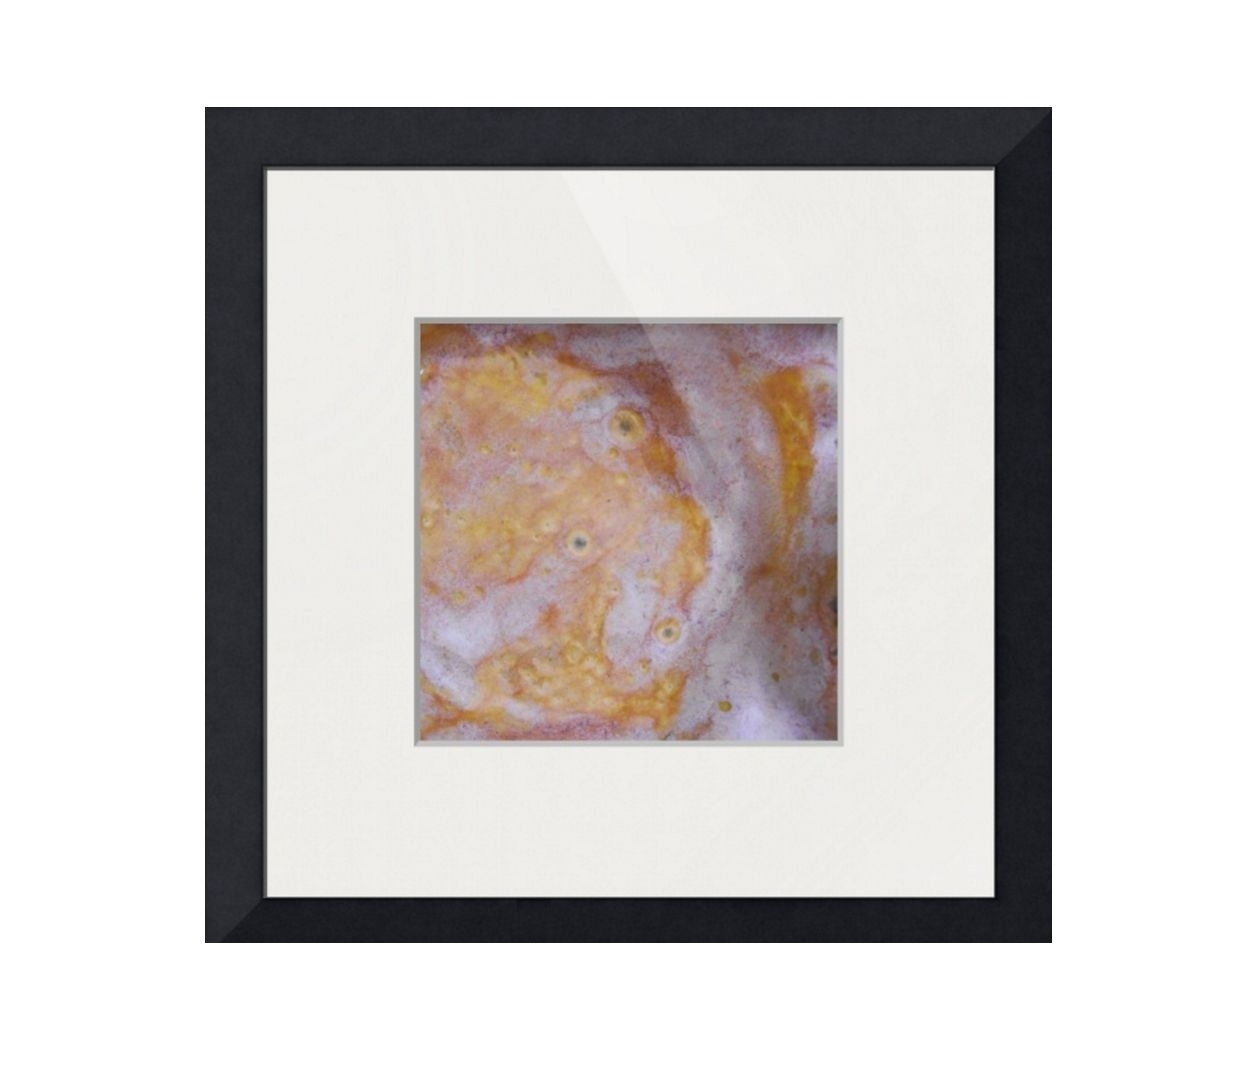 Orange Beige And White Modern Framed Prints | Rustic Artwork Inside Newest Abstract Framed Art Prints (View 10 of 15)